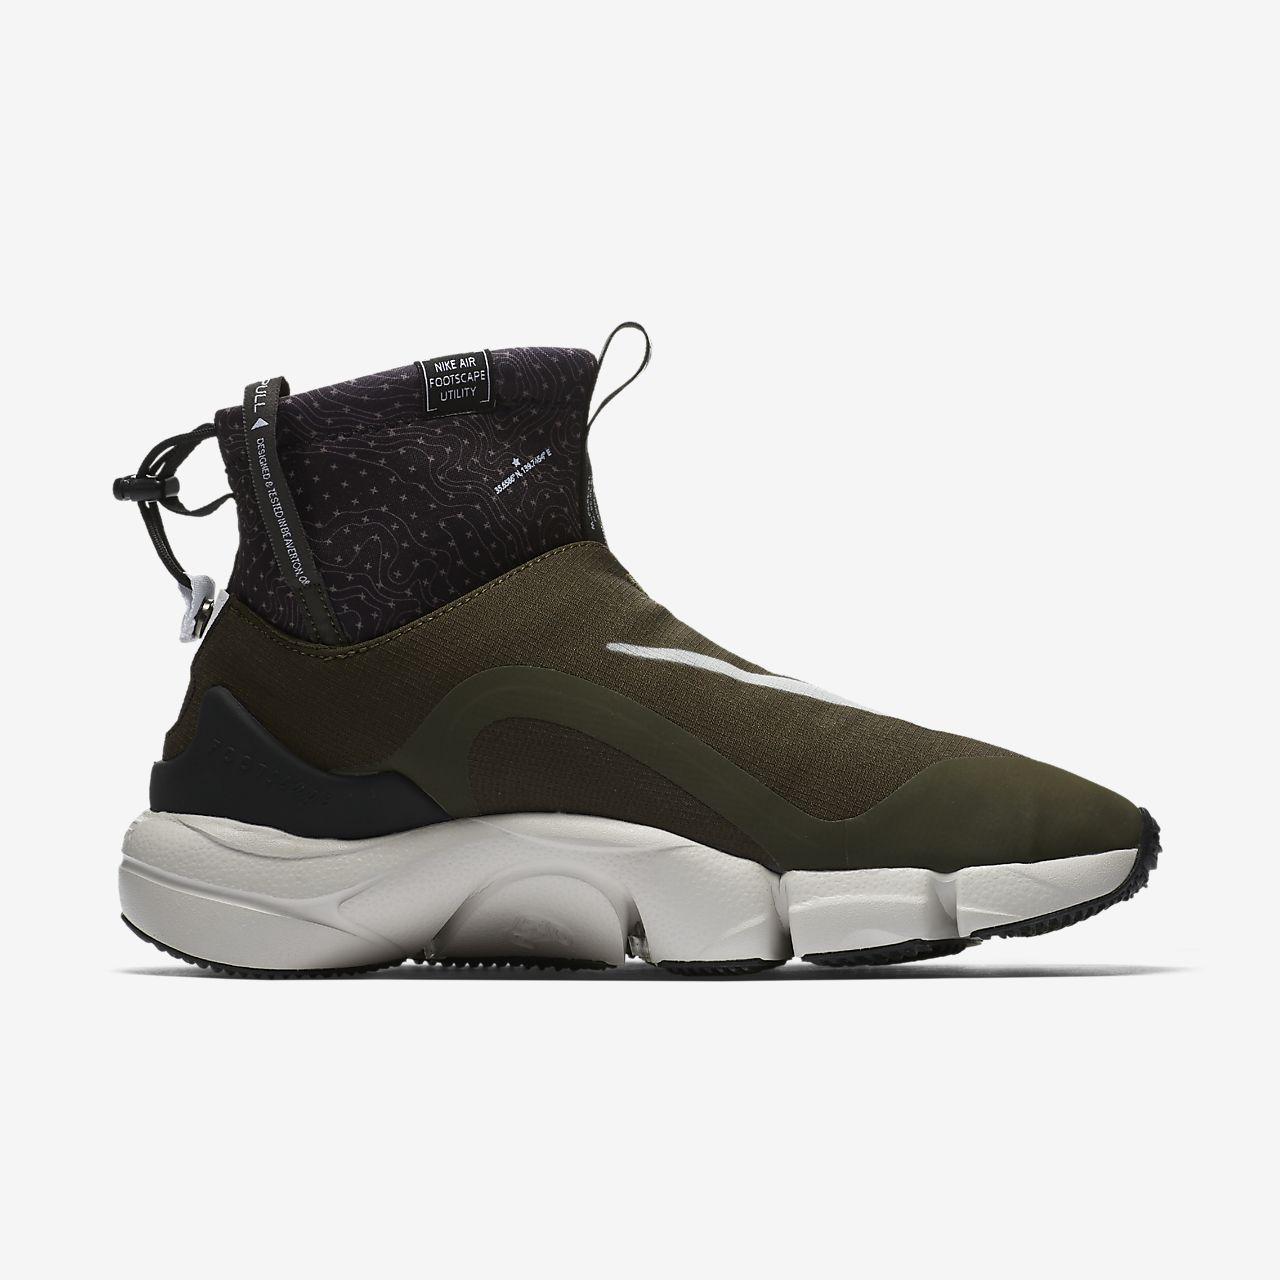 check out 8bbe8 c68e9 ... Nike Air Footscape Mid Utility Zapatillas - Hombre